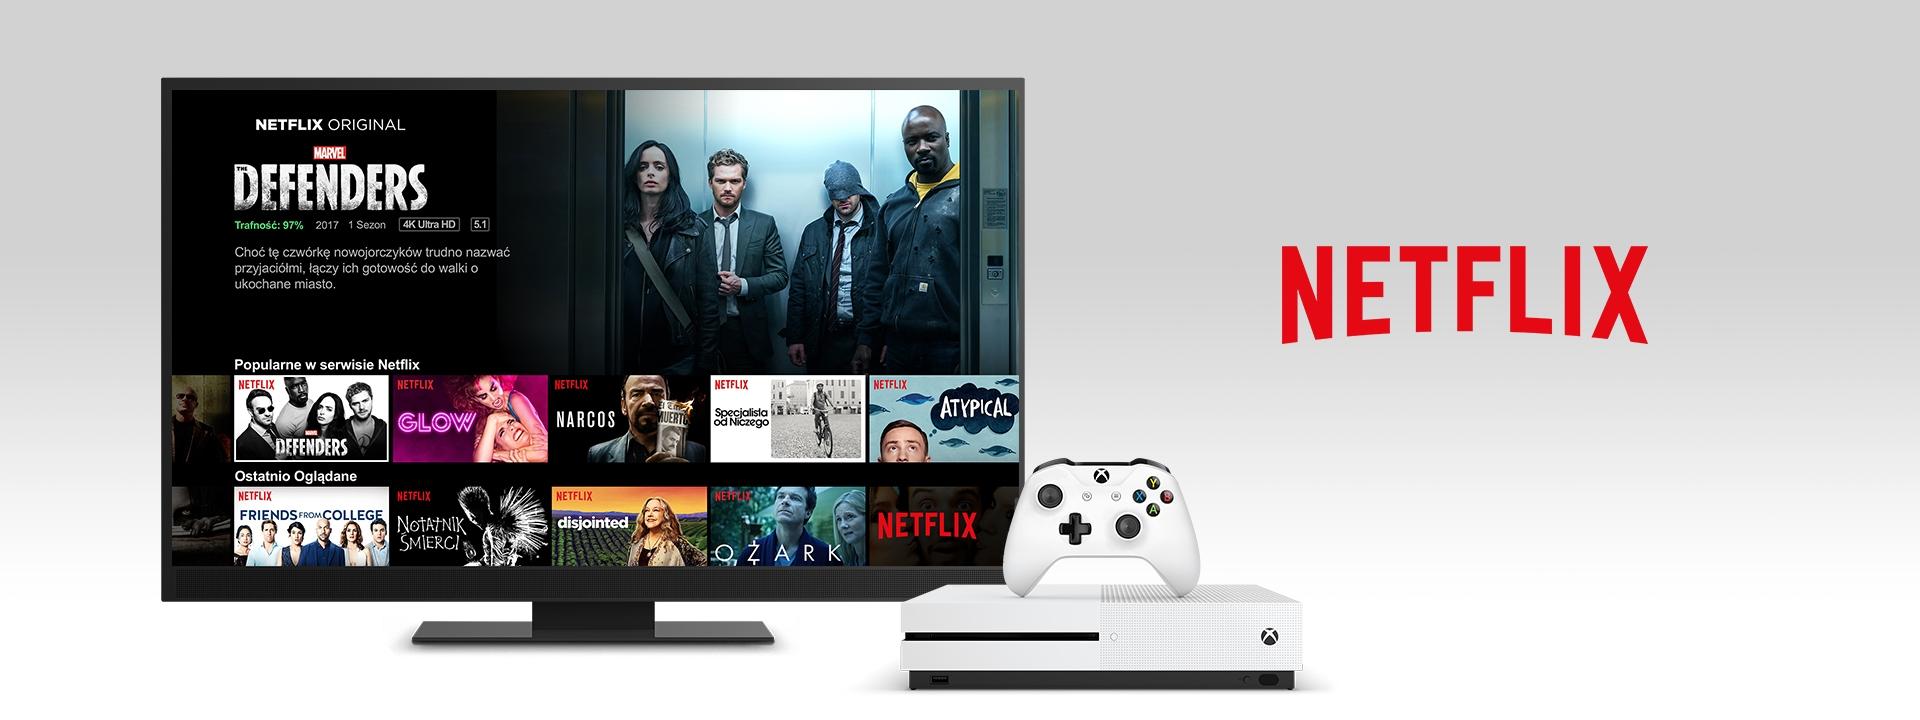 Netflix na konsoli Xbox One